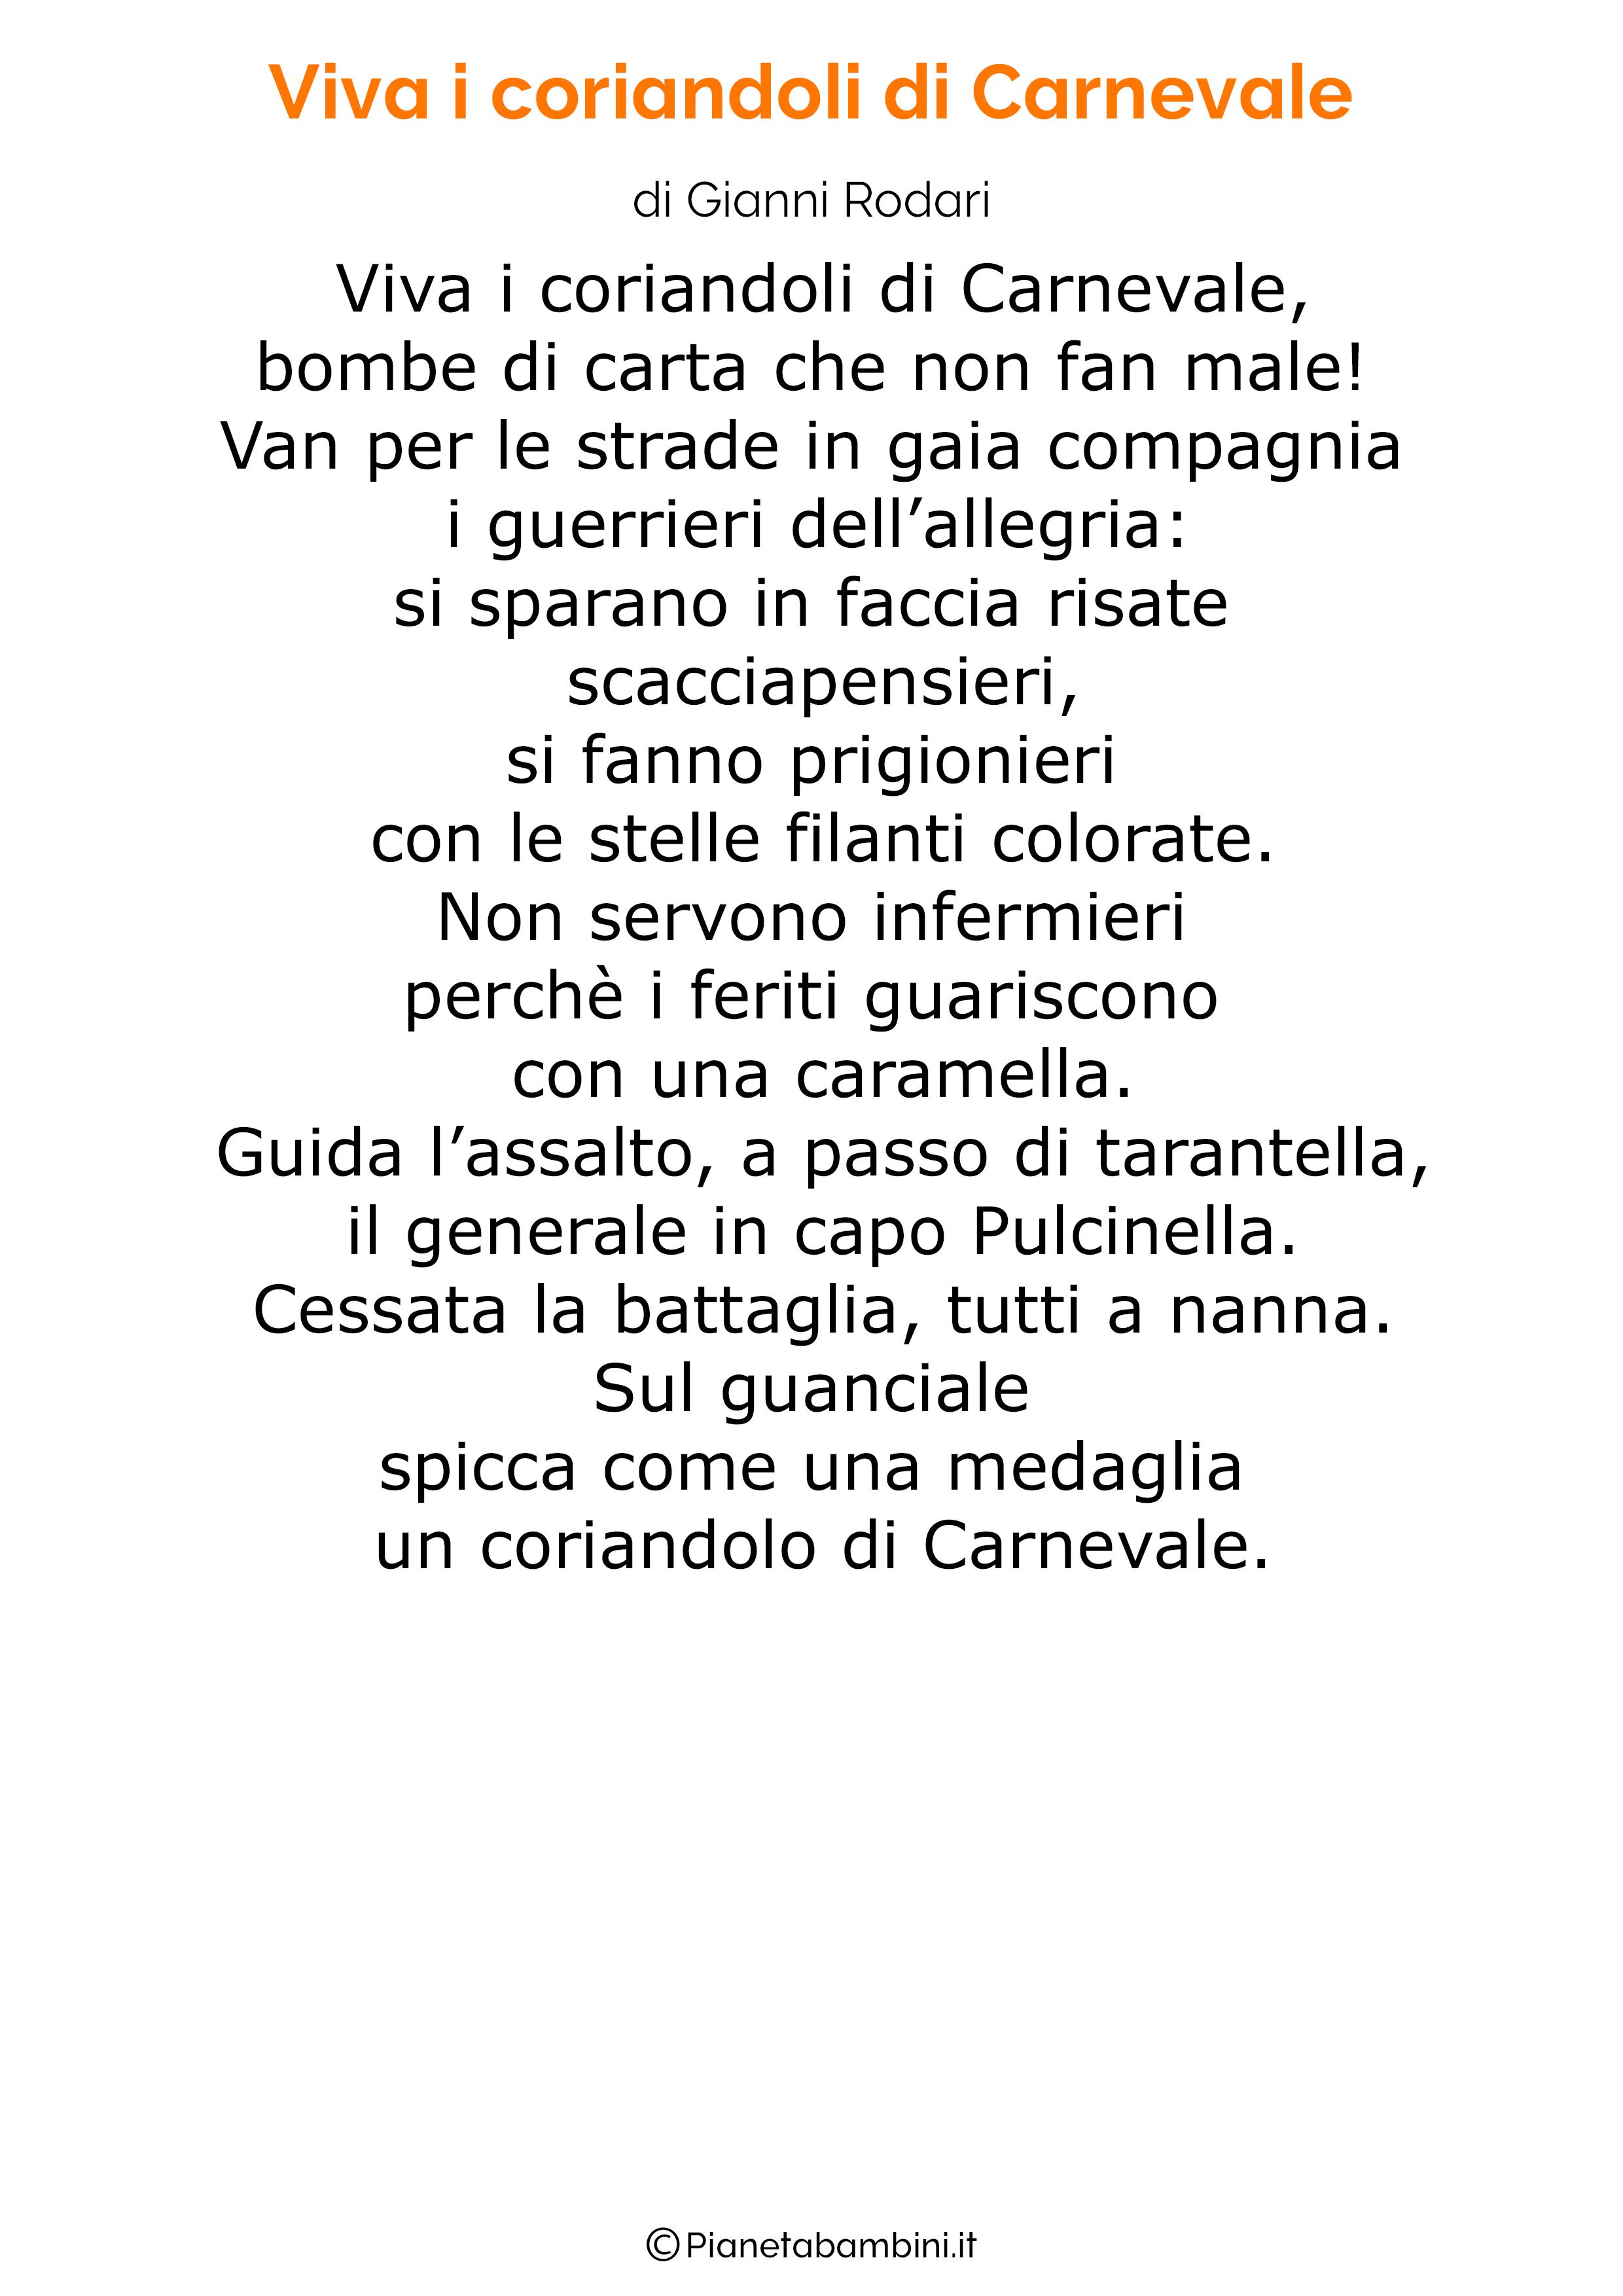 Poesie di Carnevale per bambini 01